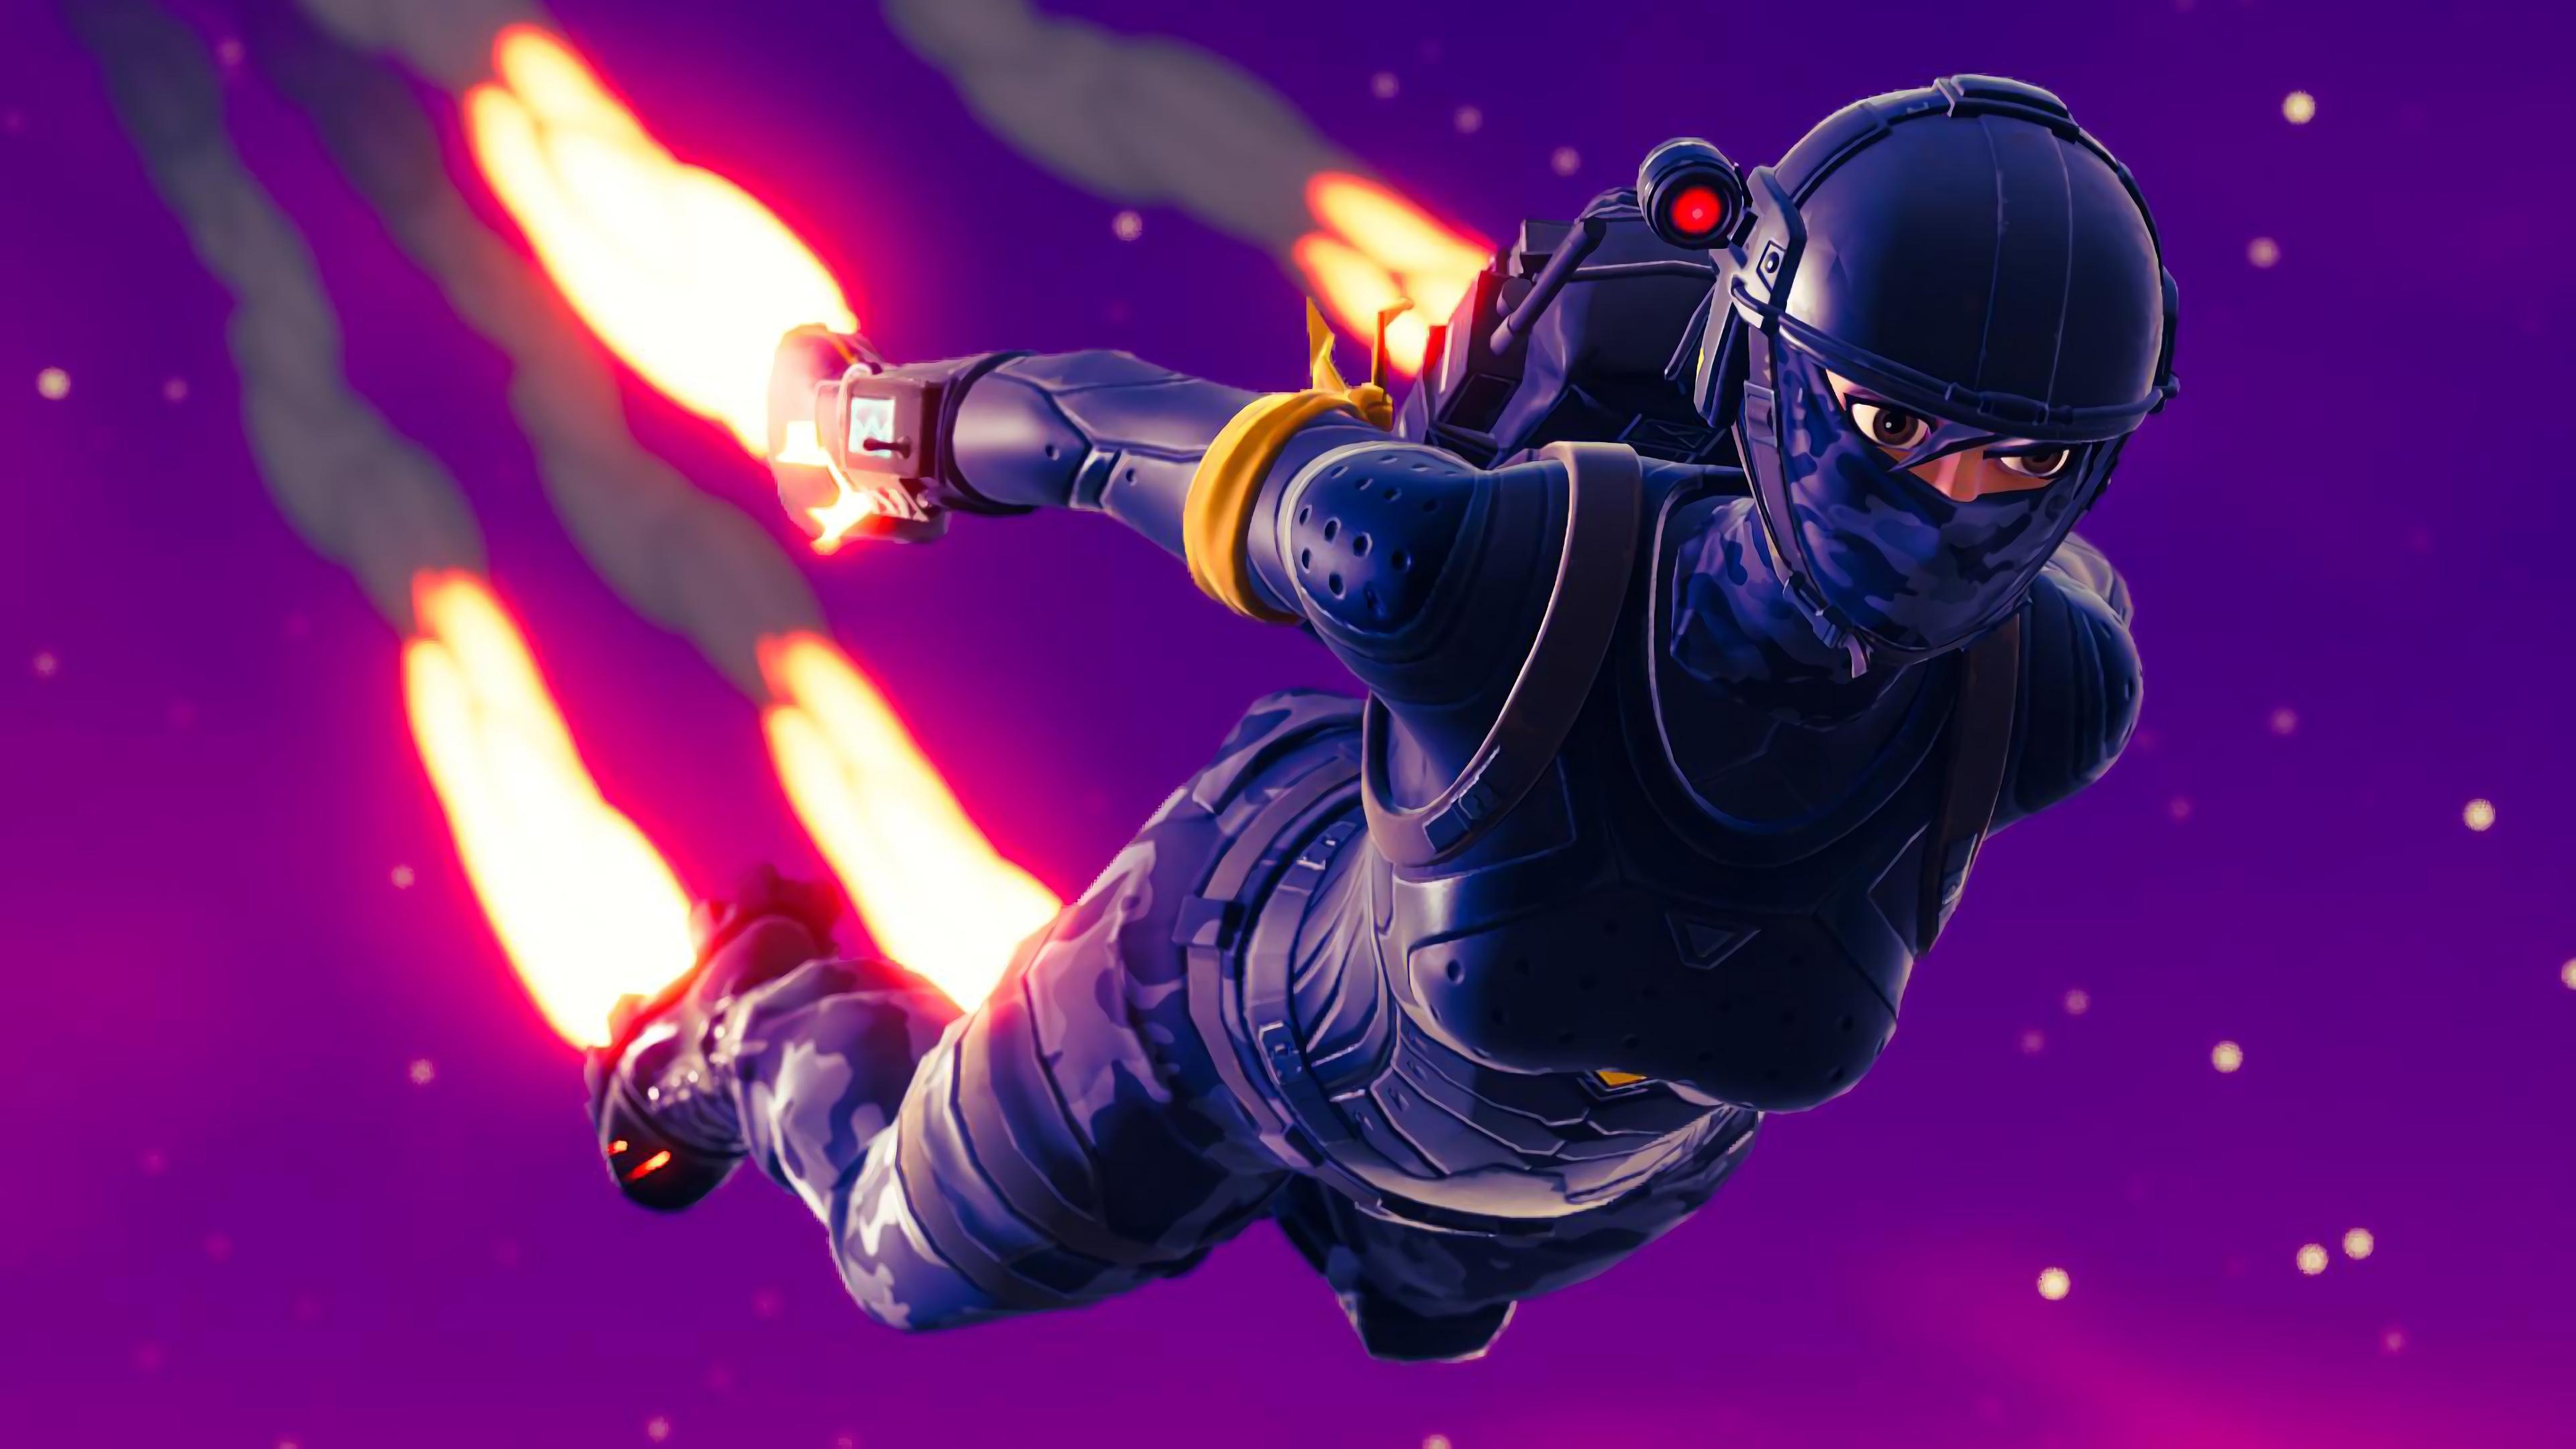 Elite Agent Skydive Fortnite Battle Royale 3d 4k Ultra Fondo